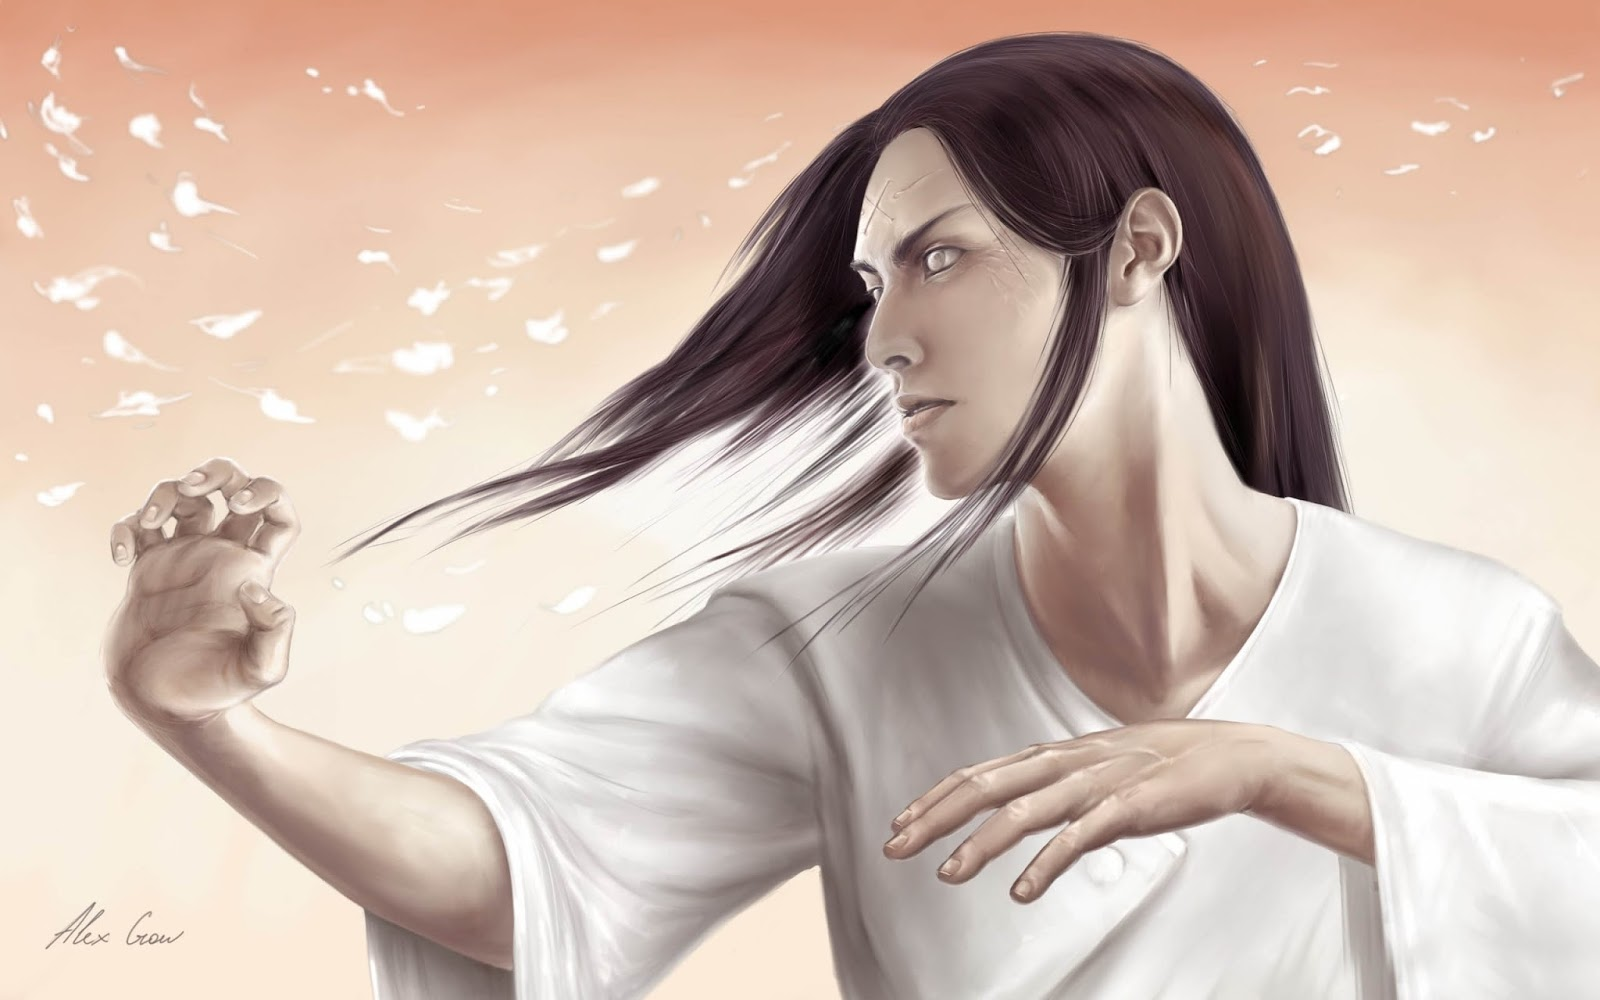 Naruto lemons: Hyuuga}X{ Logical }X{ Neji (Request for ...